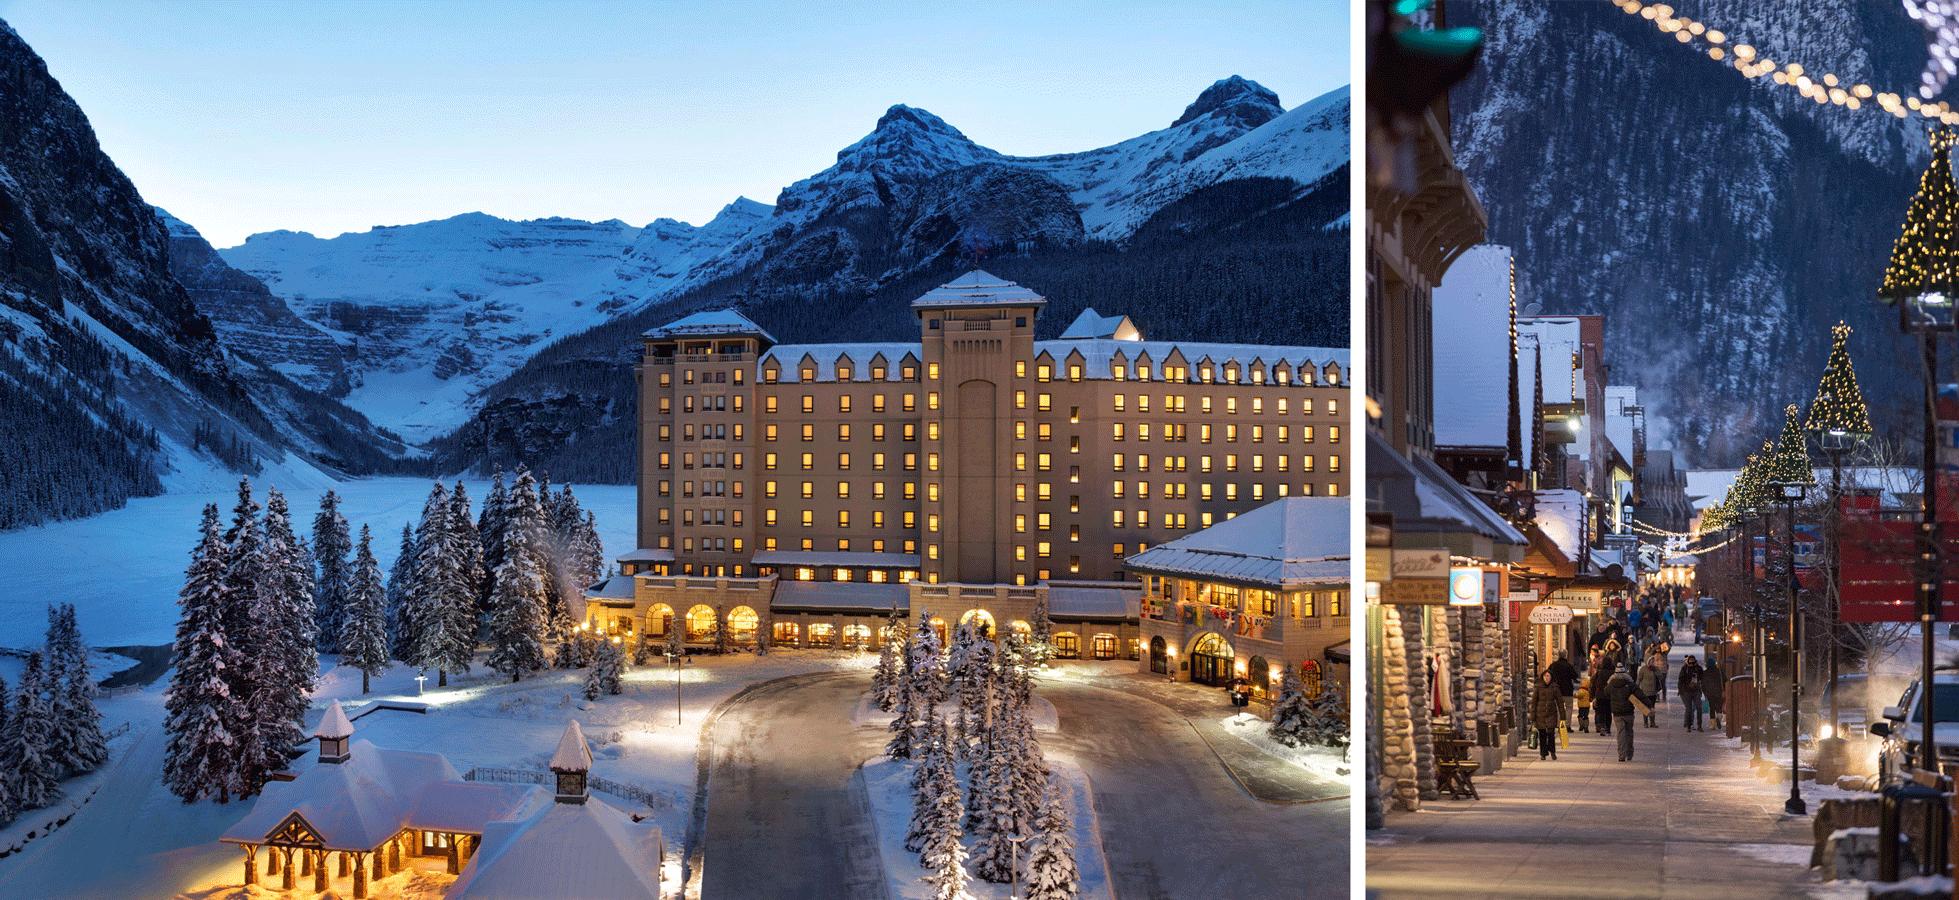 Links: Hotel in Lake Louise. Rechts: Promenade in Banff.